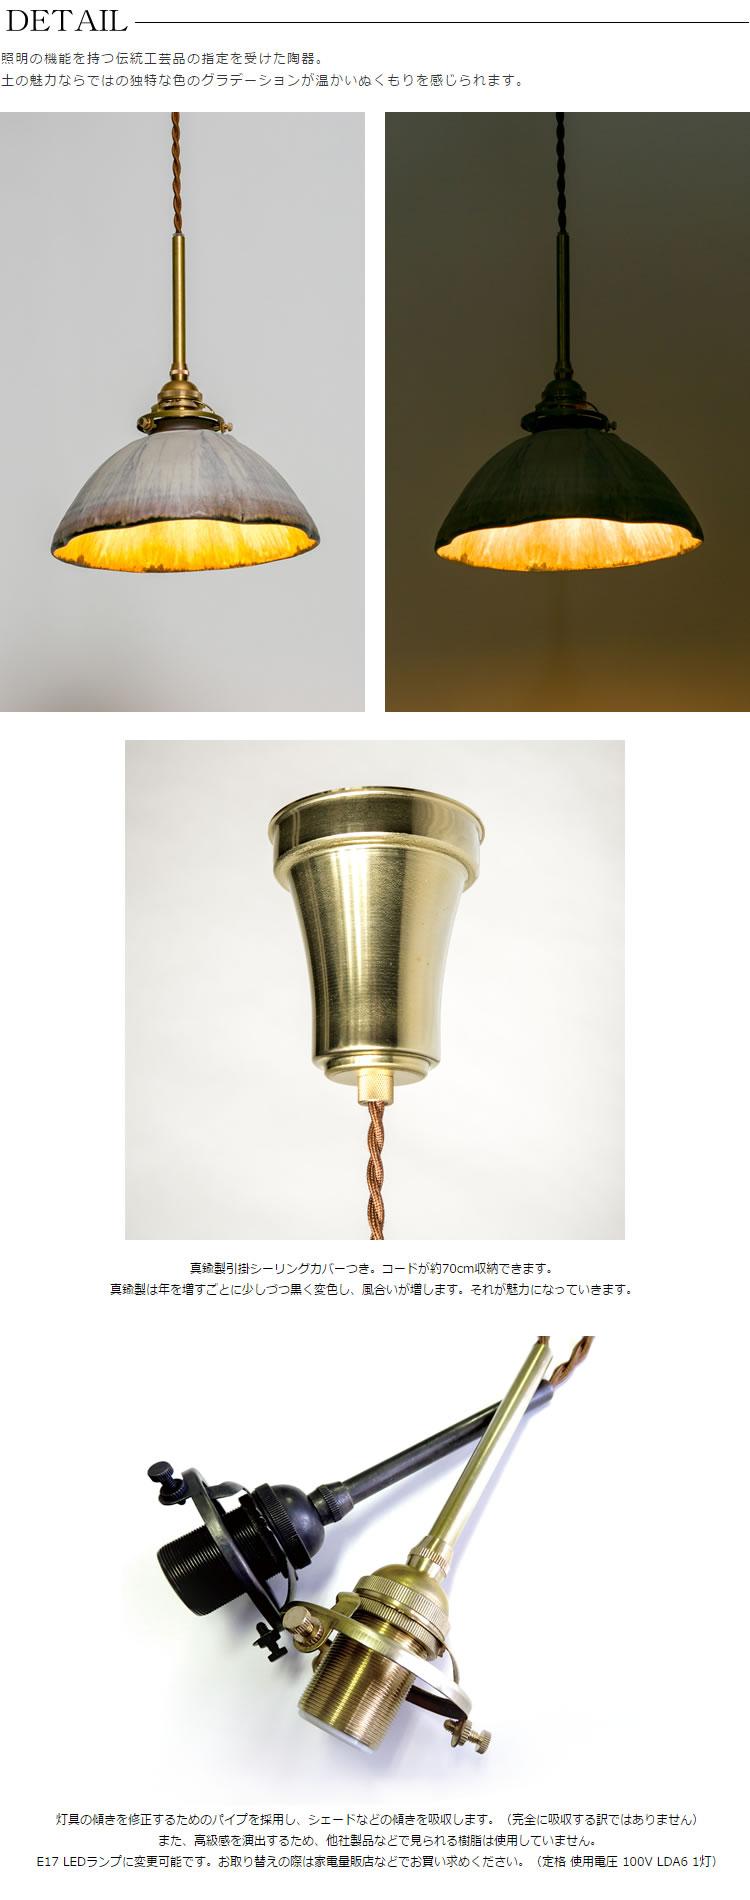 HASU(青模様陶器・引掛・真鍮)